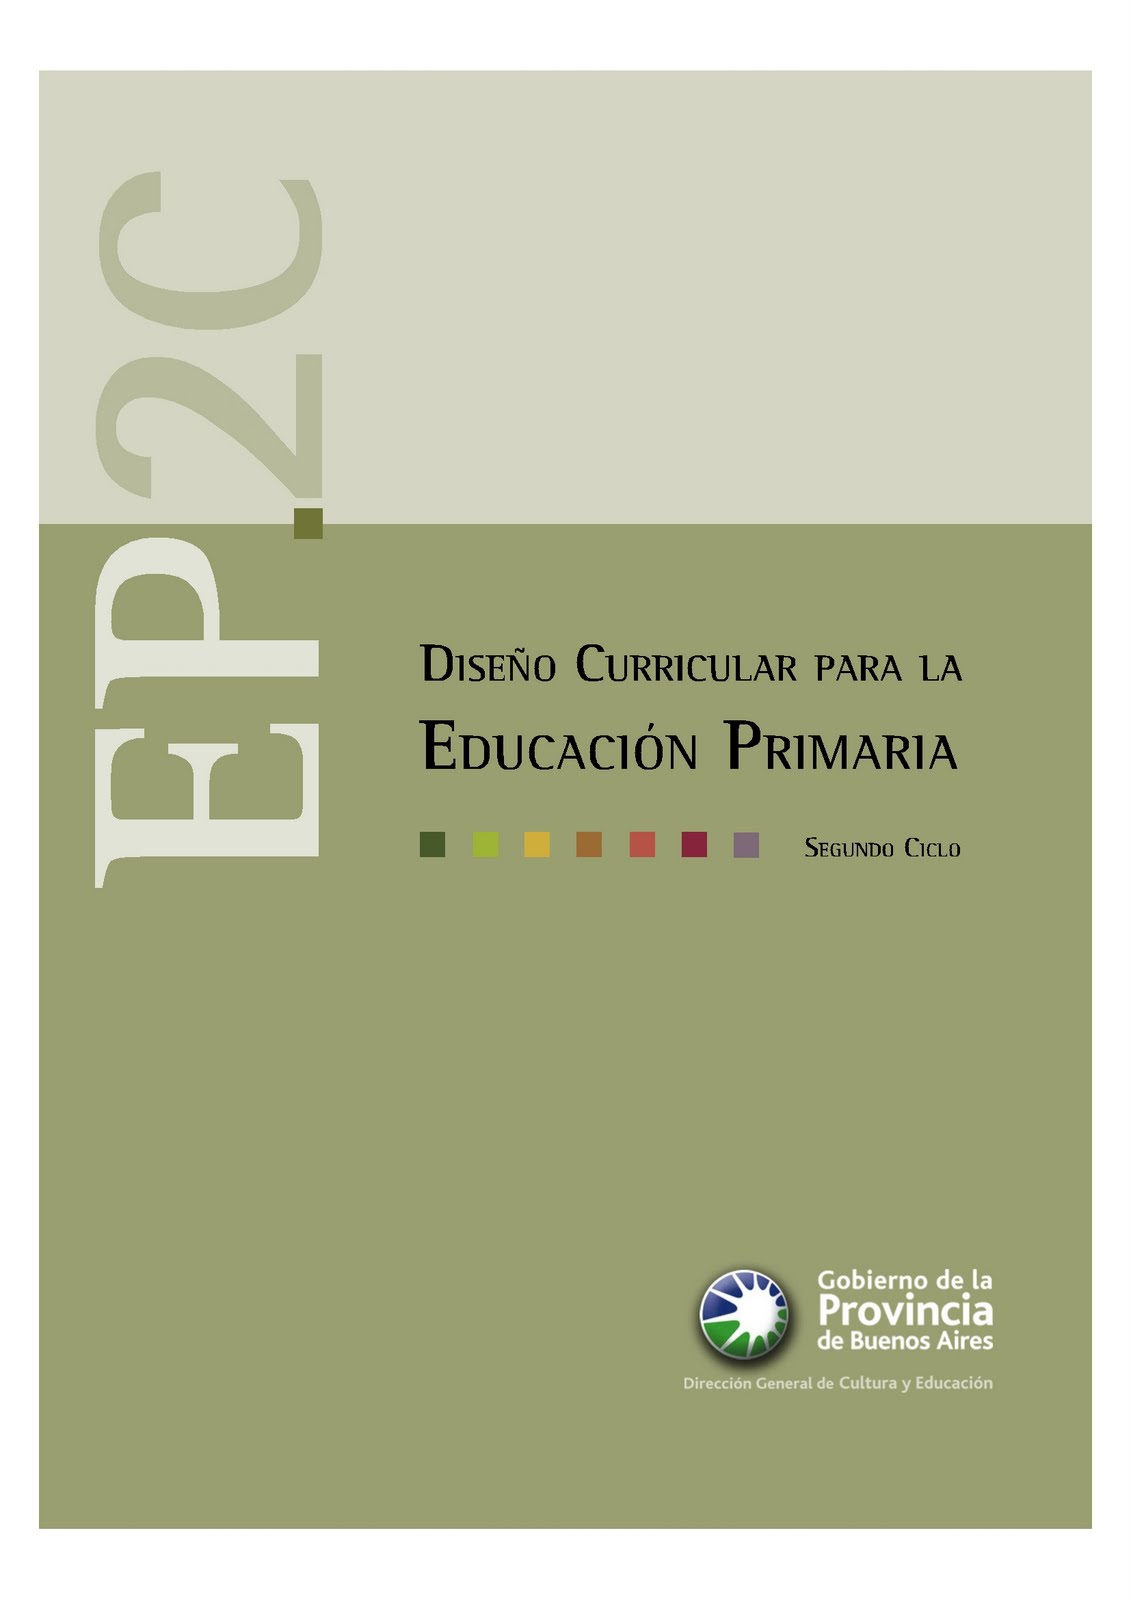 diseño curricular segundo ciclo de primaria